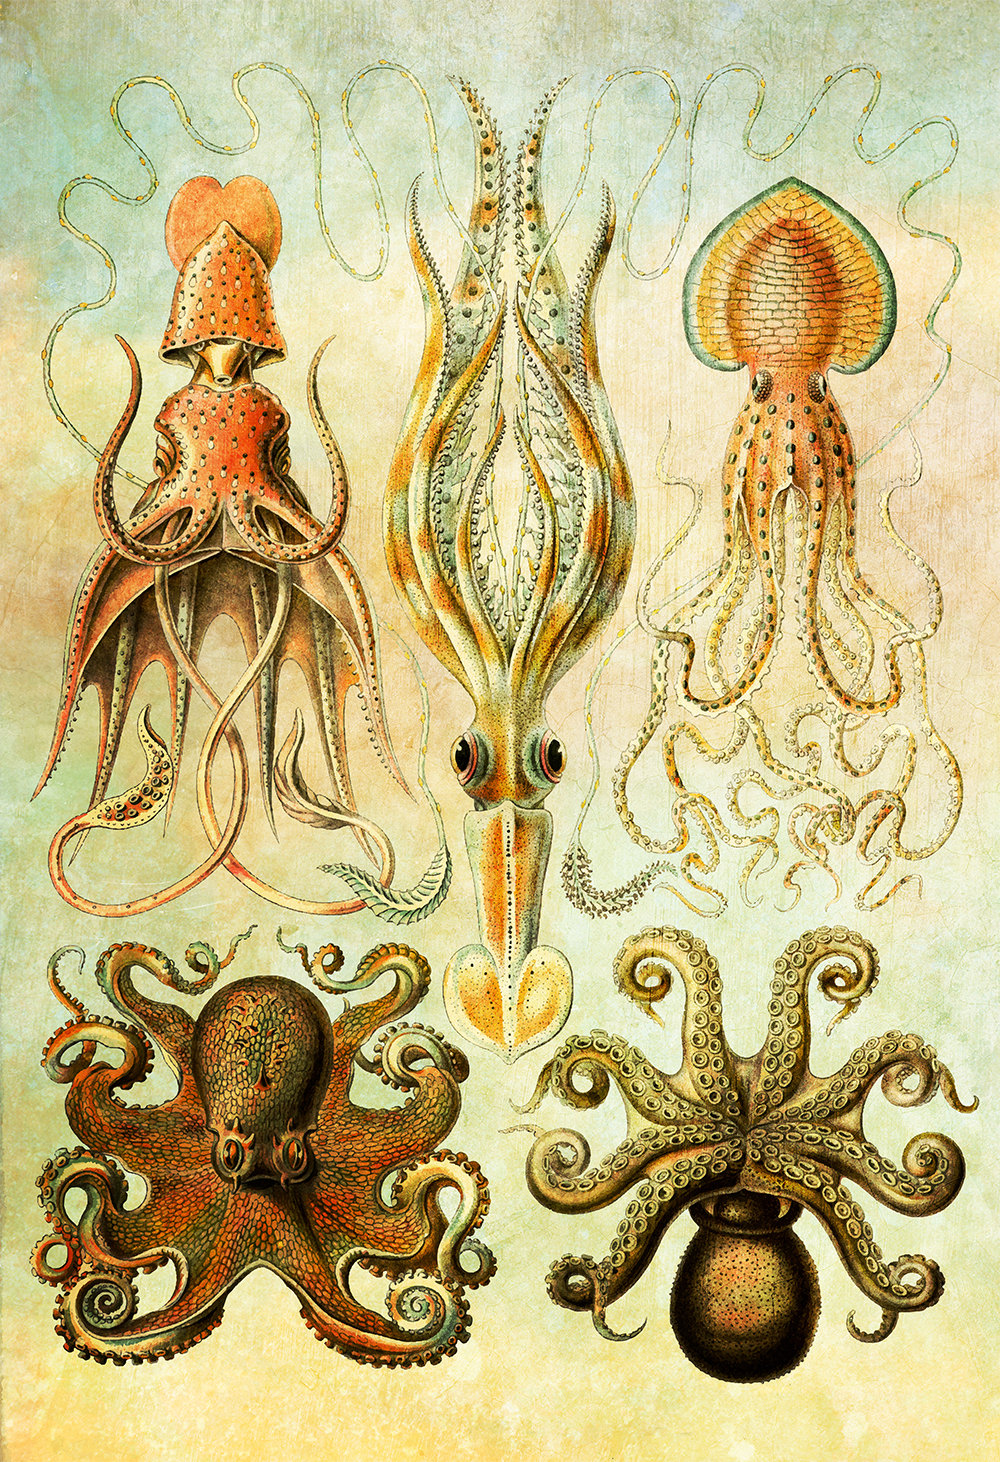 ernst-haeckel-gamochonia-print-octopus-and-squid-art-vintage-nautical-decor-ocean-wall-art-giclee-print-on-canvas-satin-5817b2bf4.jpg